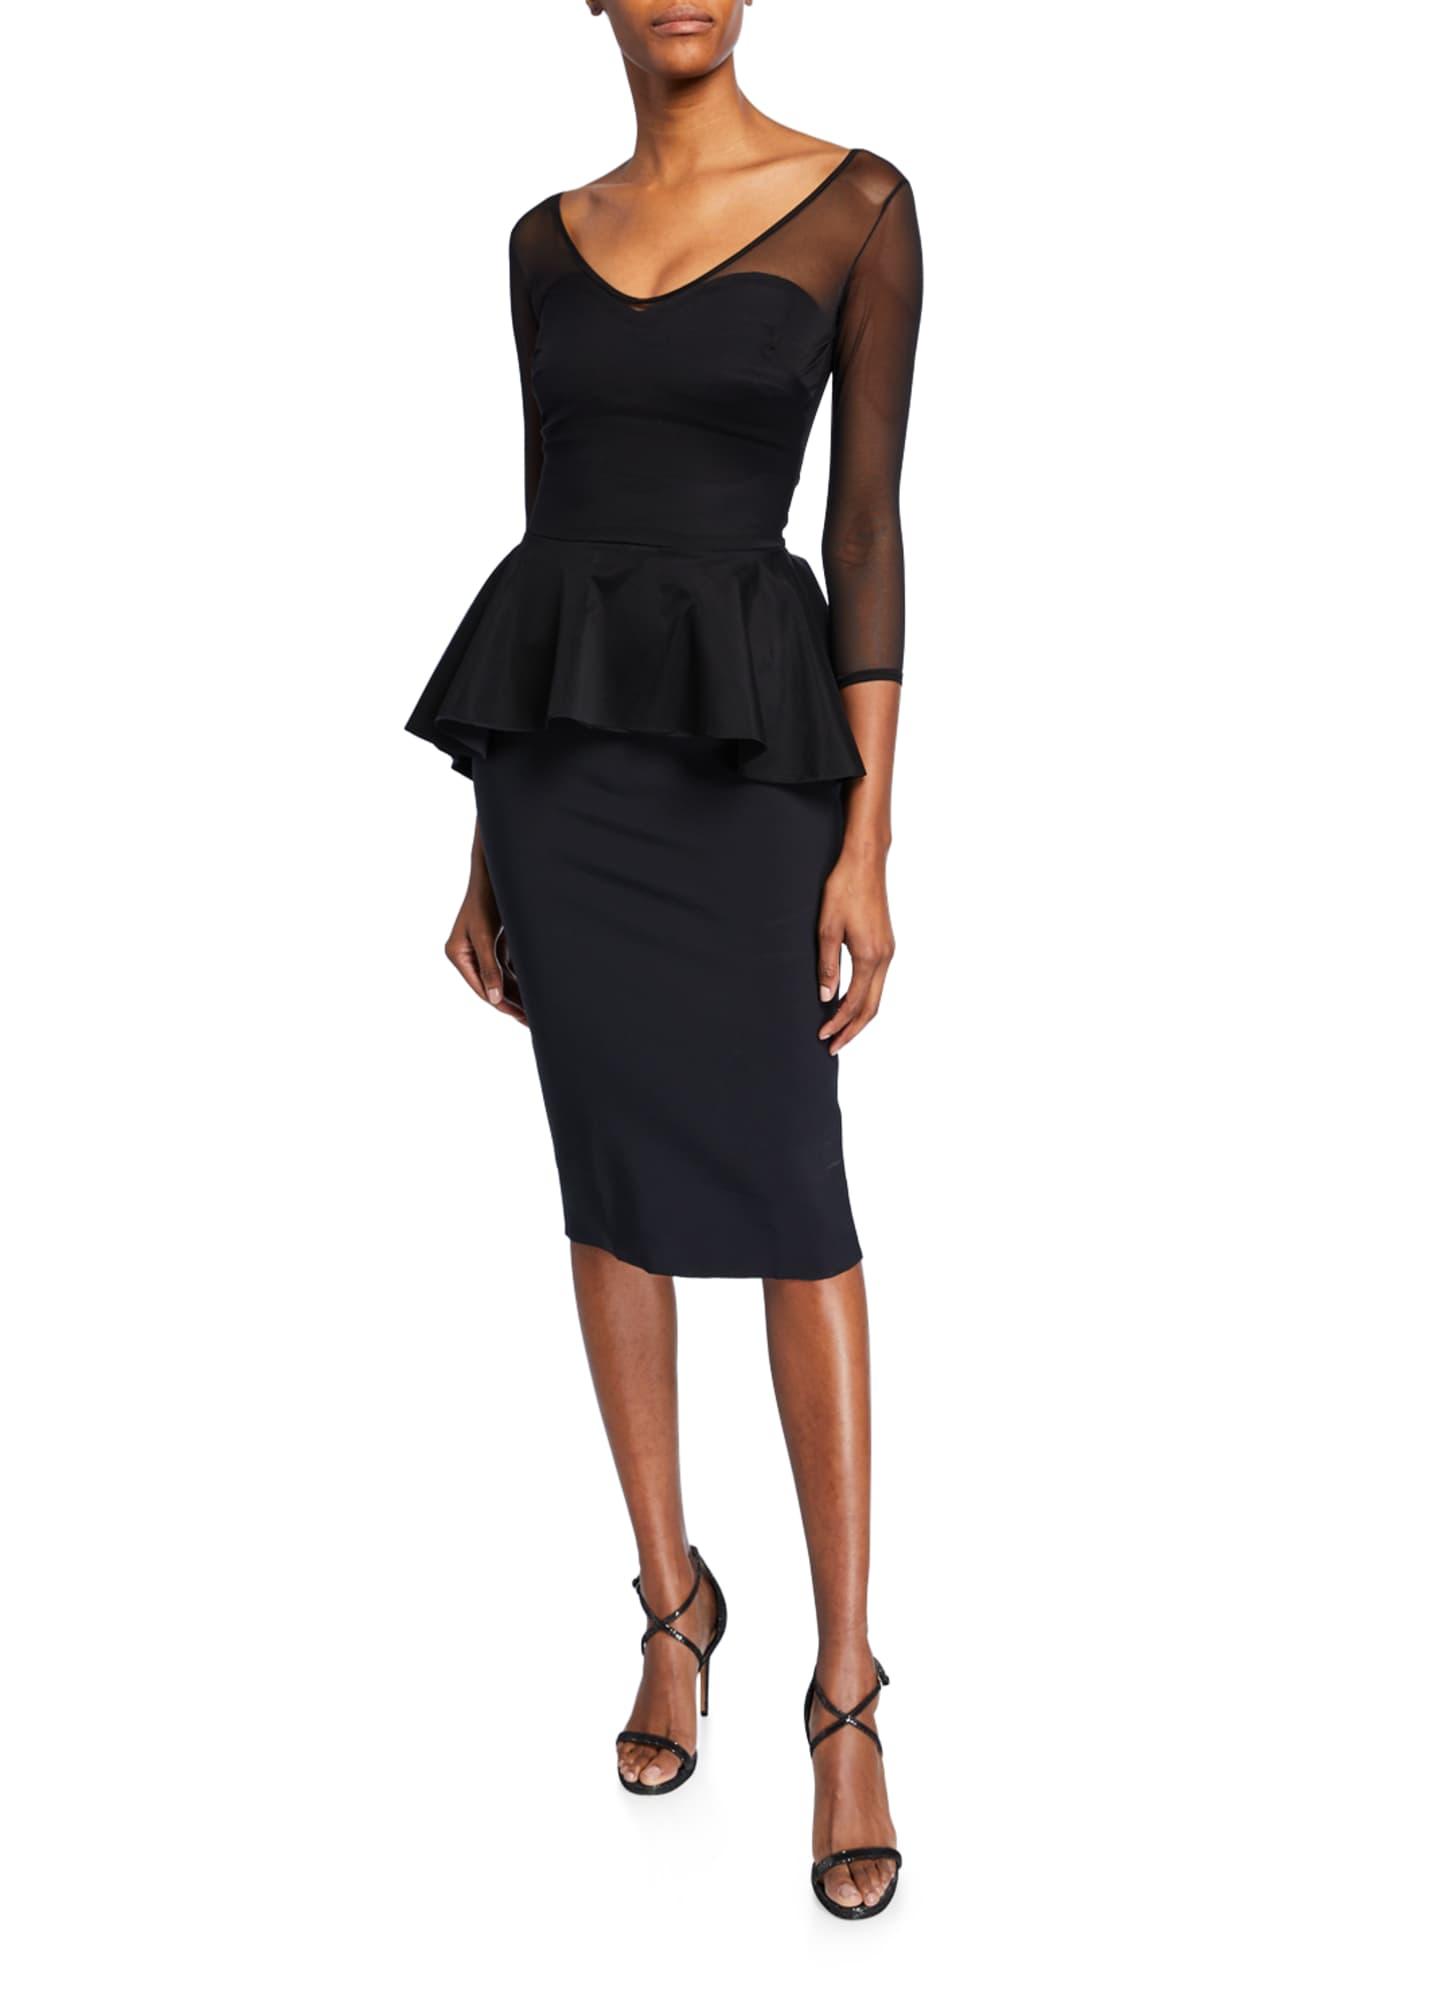 Chiara Boni La Petite Robe Arquette Illusion 3/4-Sleeve